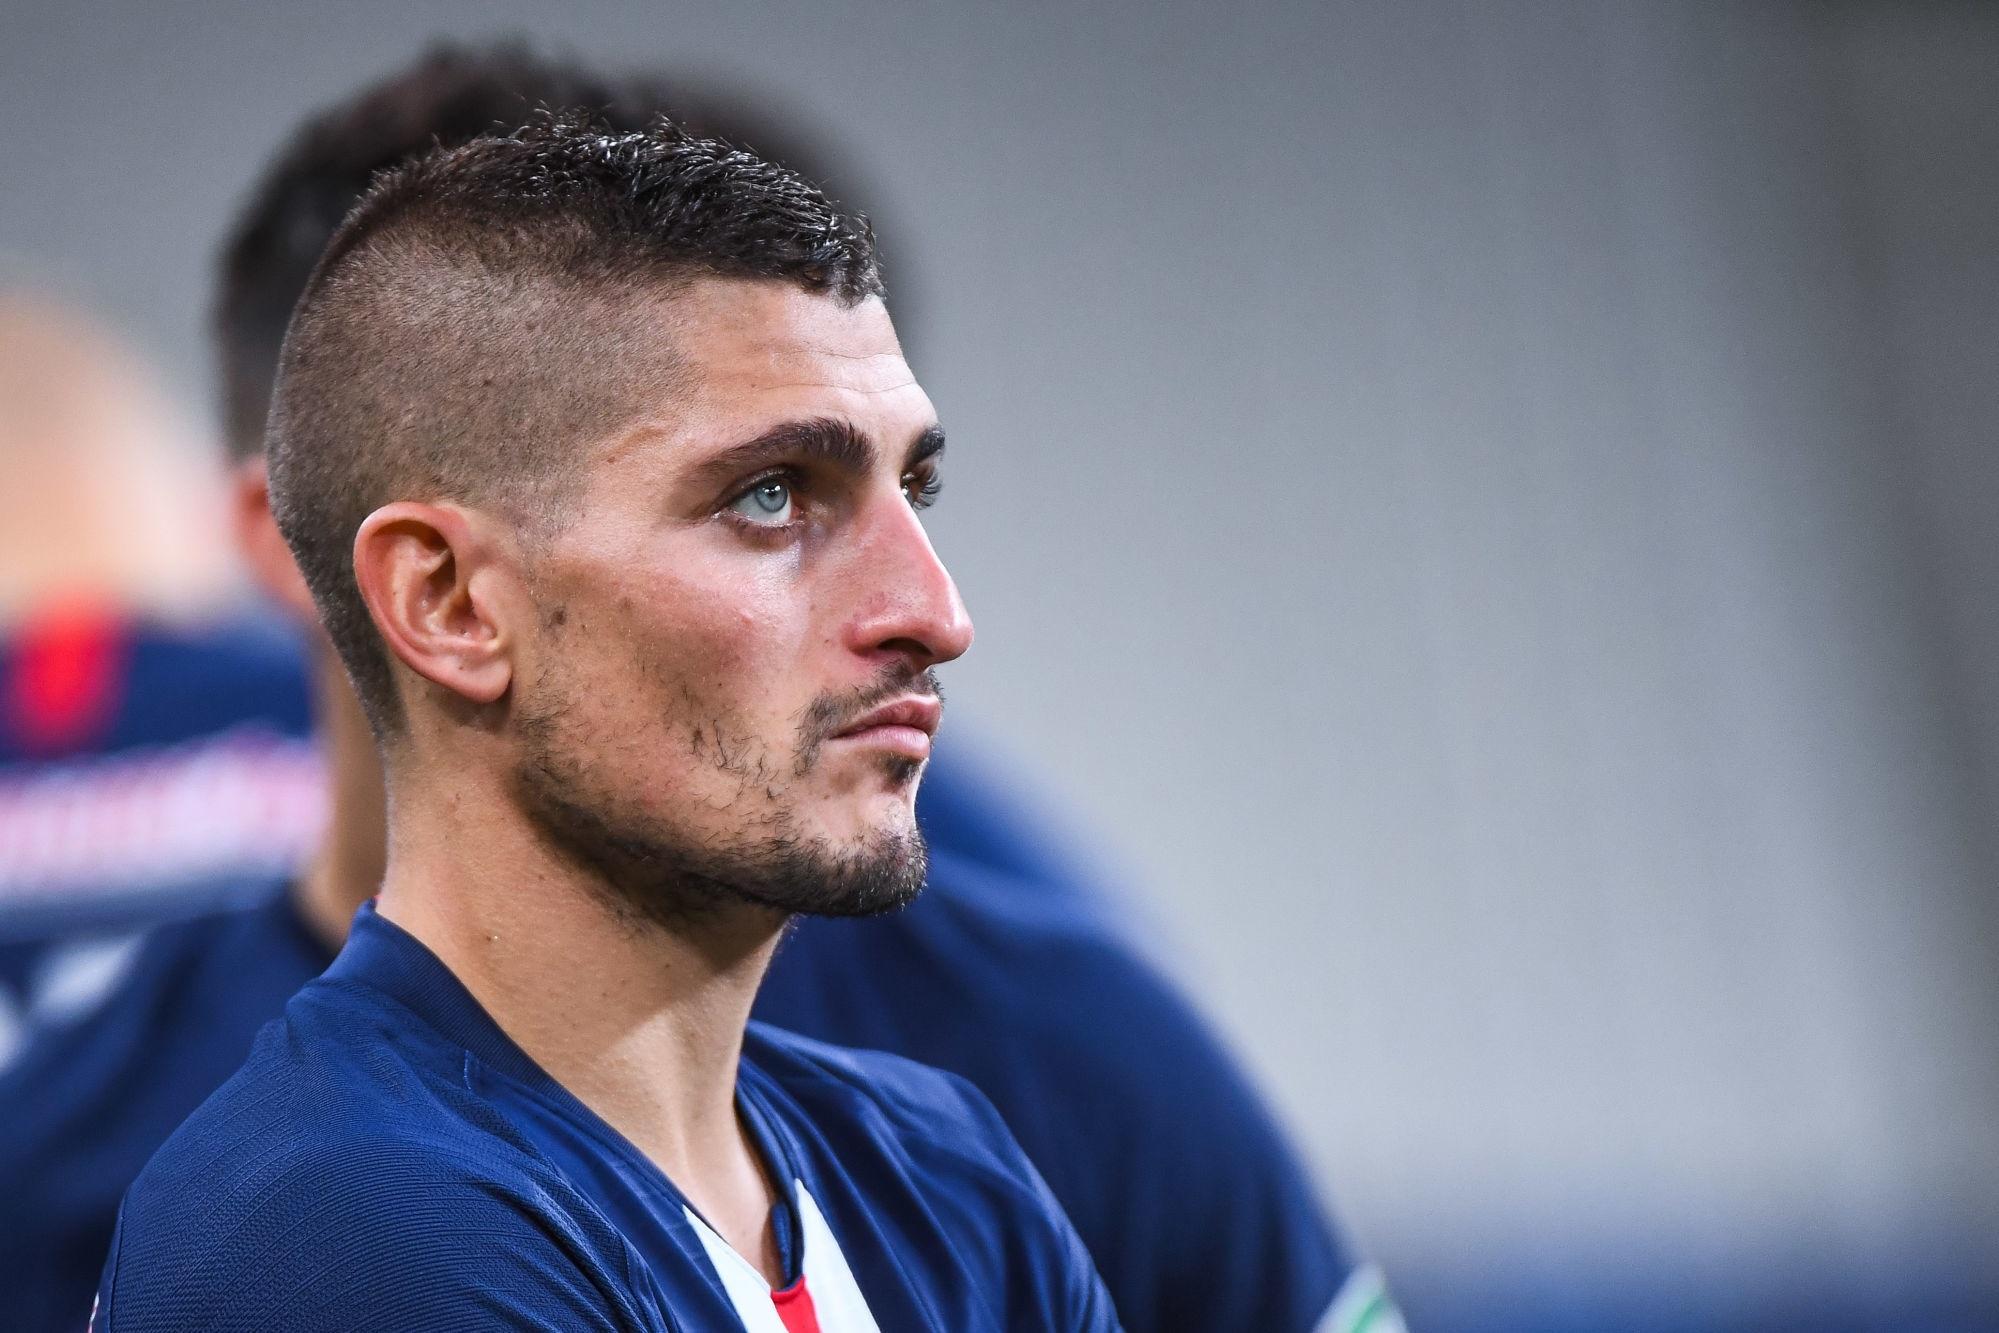 Verratti sera absent environ 3 semaines, annonce RMC Sport